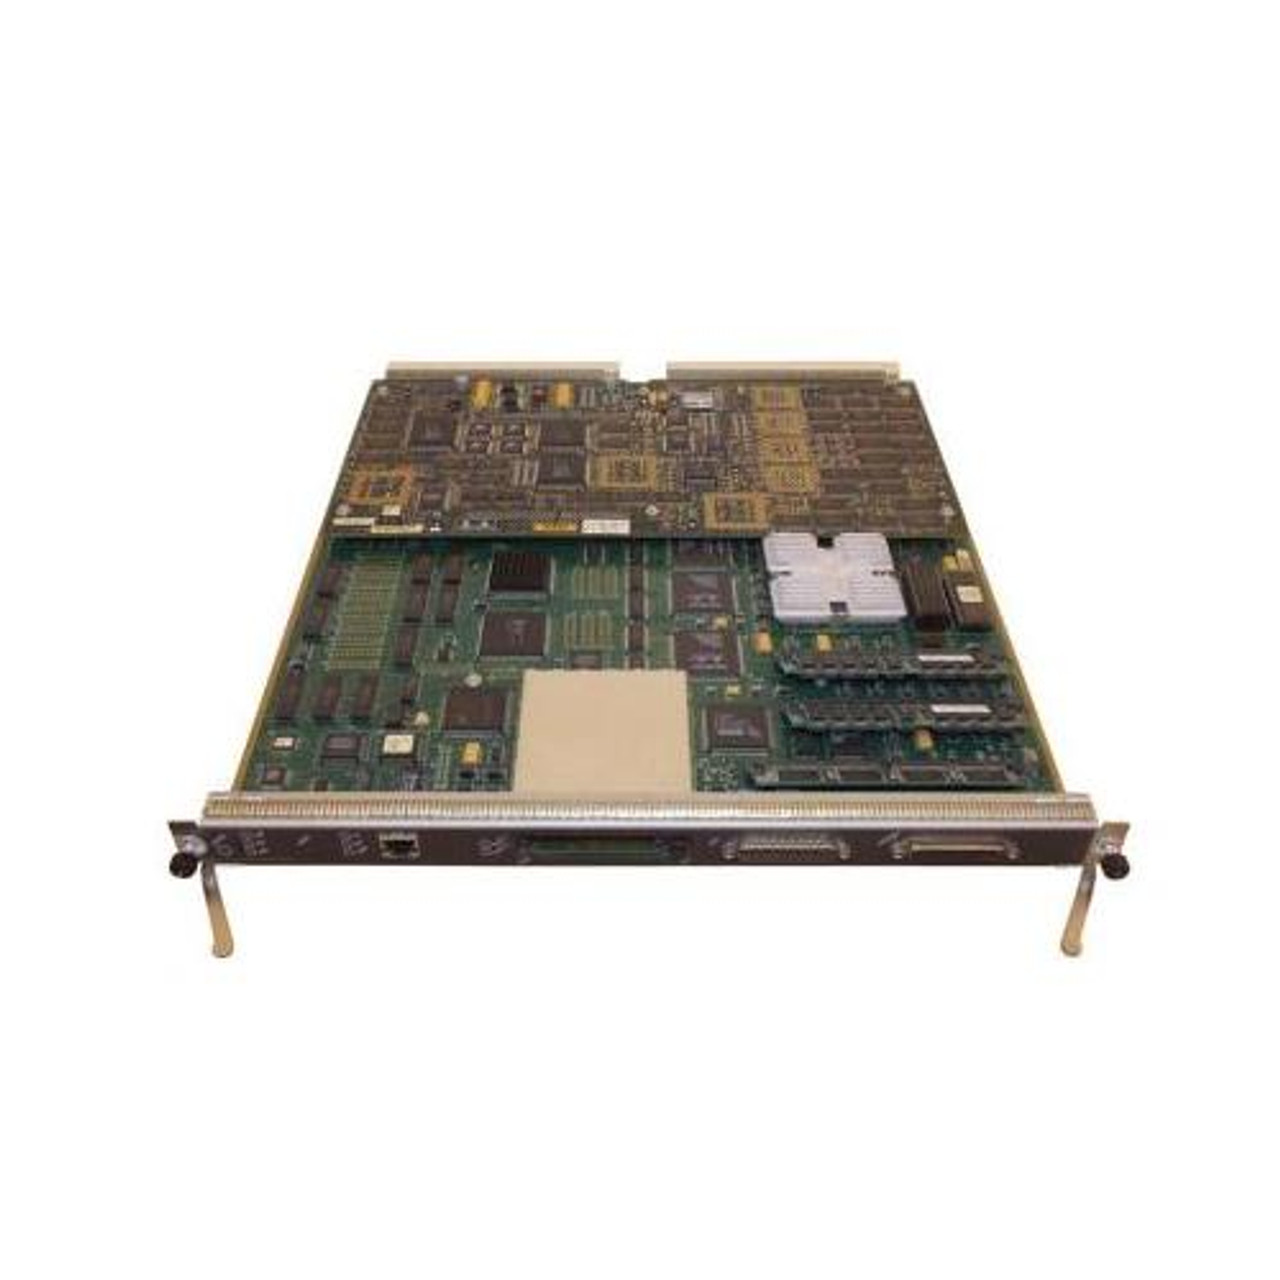 CISCO C8515-MSRP C8510 MSR Switch Route Processor